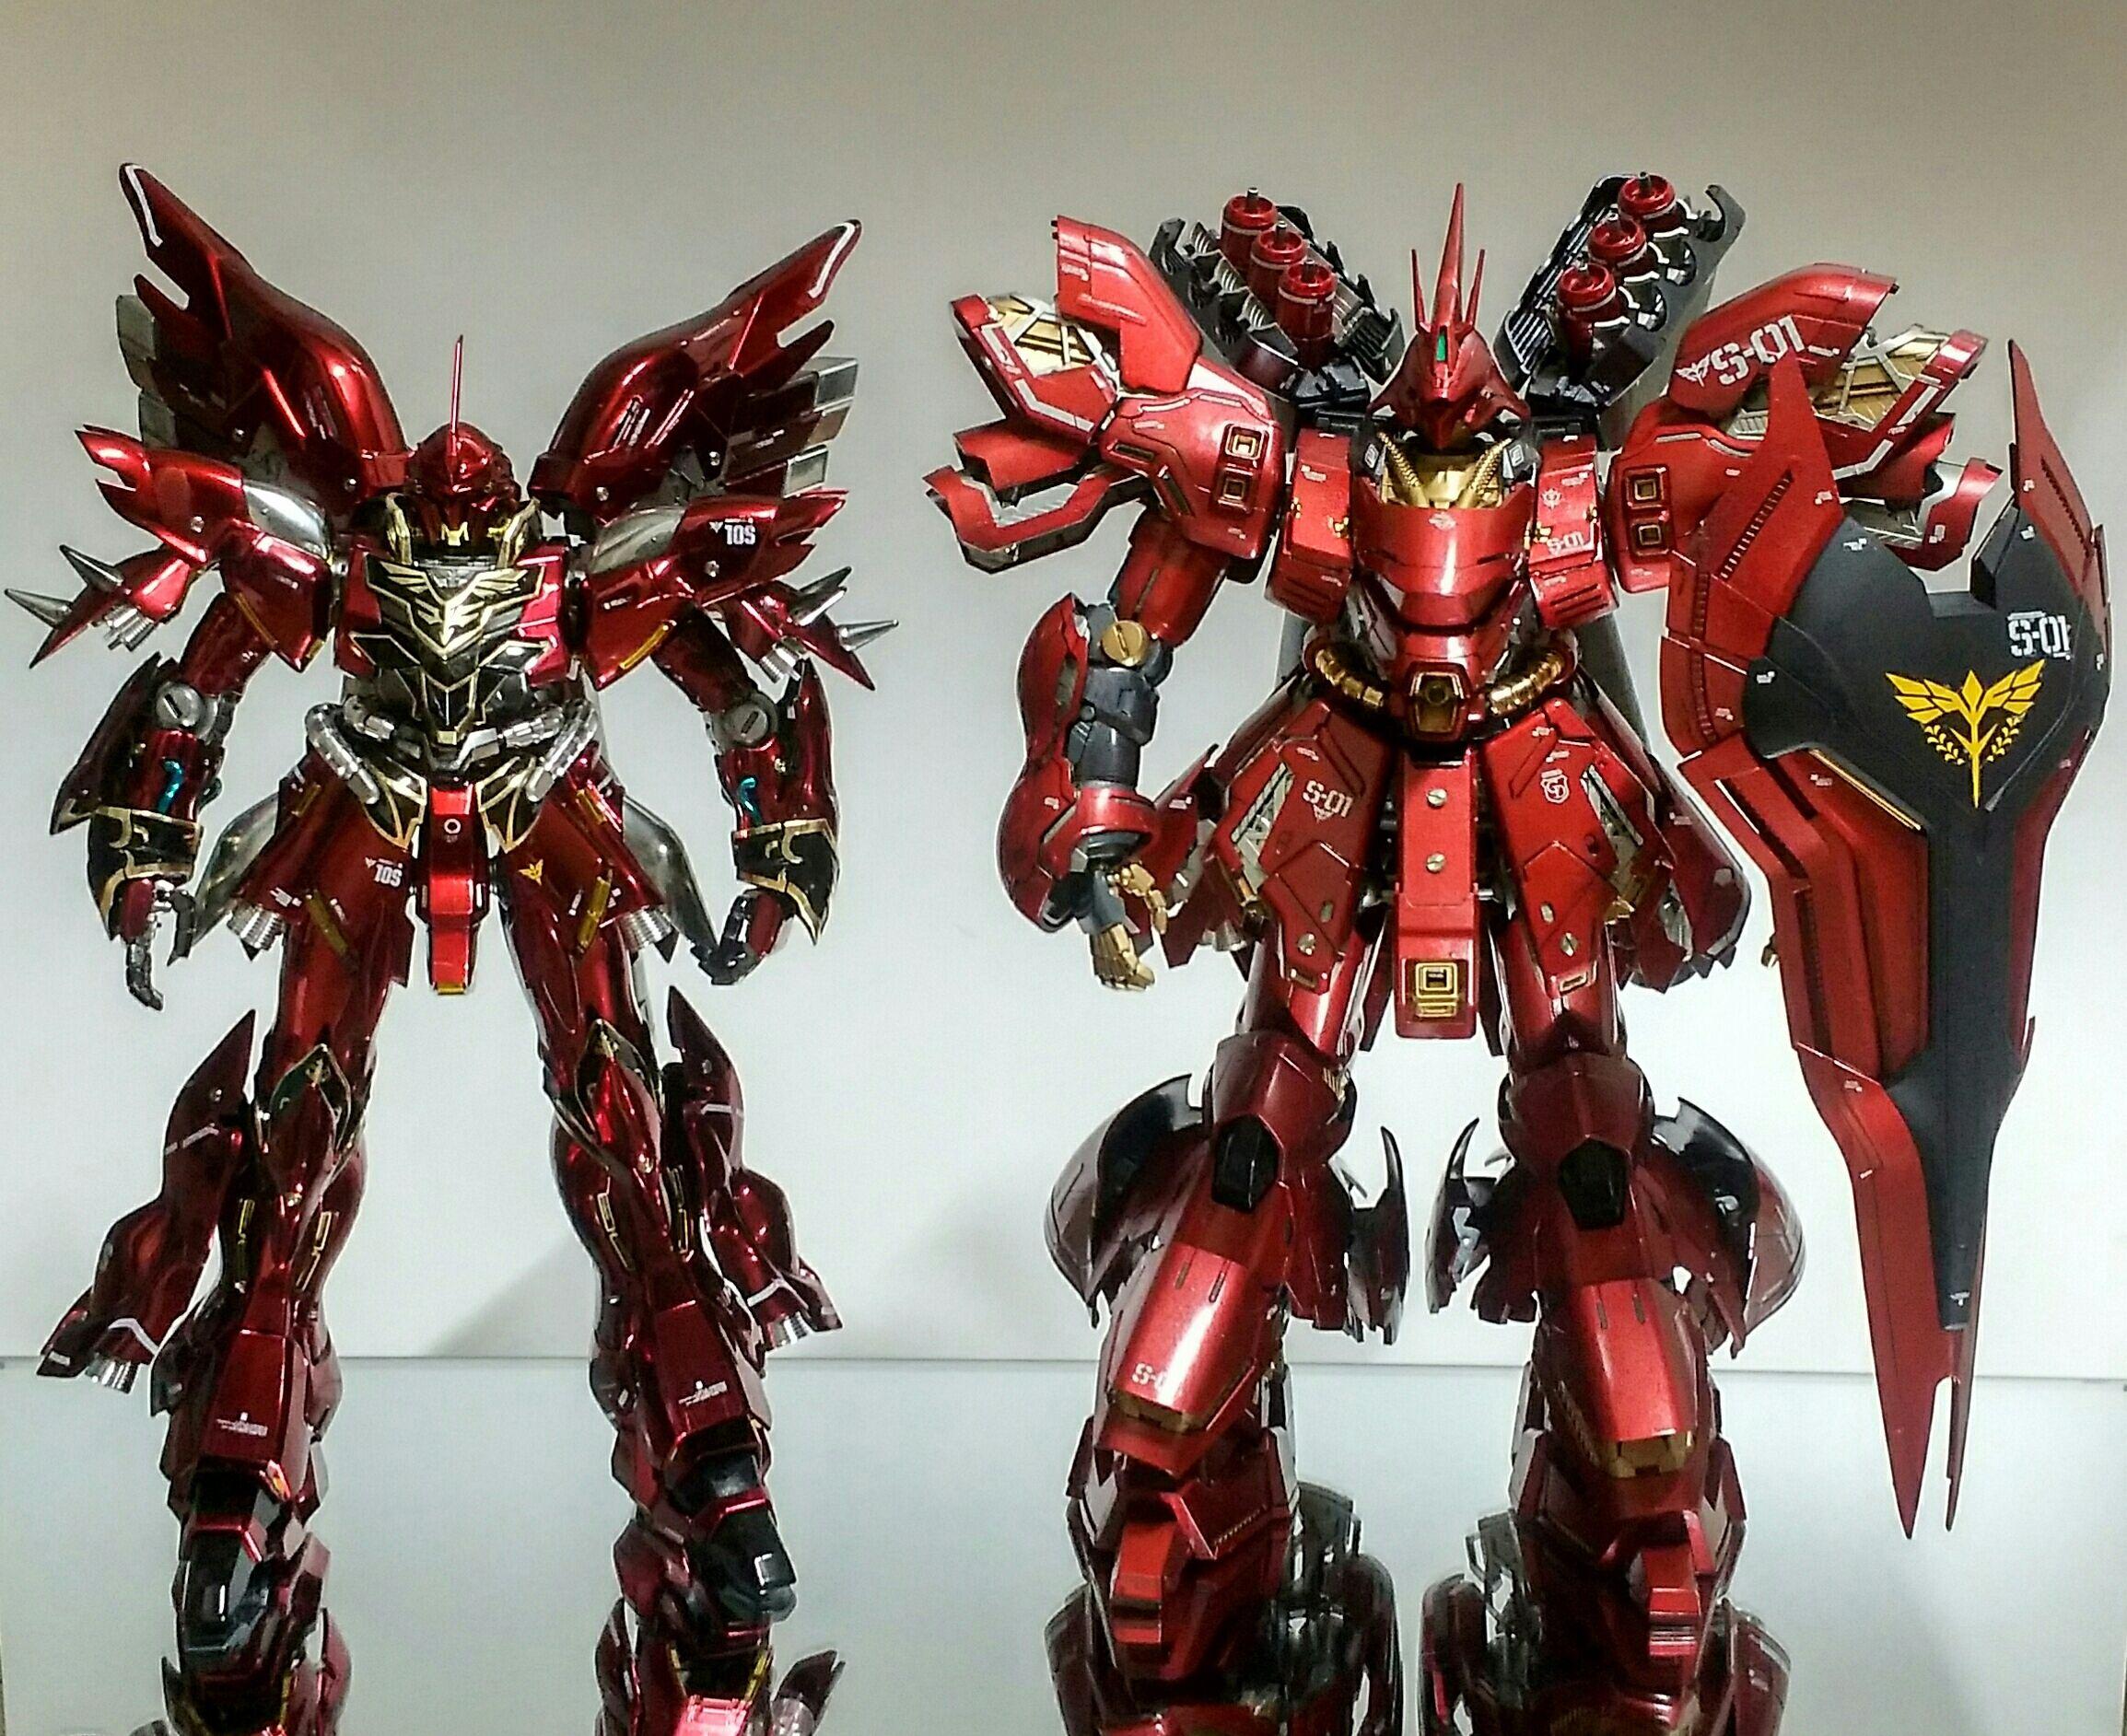 Sazabi Vs Sinanju Mg 1 100 Ova Ver Painted Build Gundam Rx 93 V Nu Ka Master Grade 1100 Daban Model